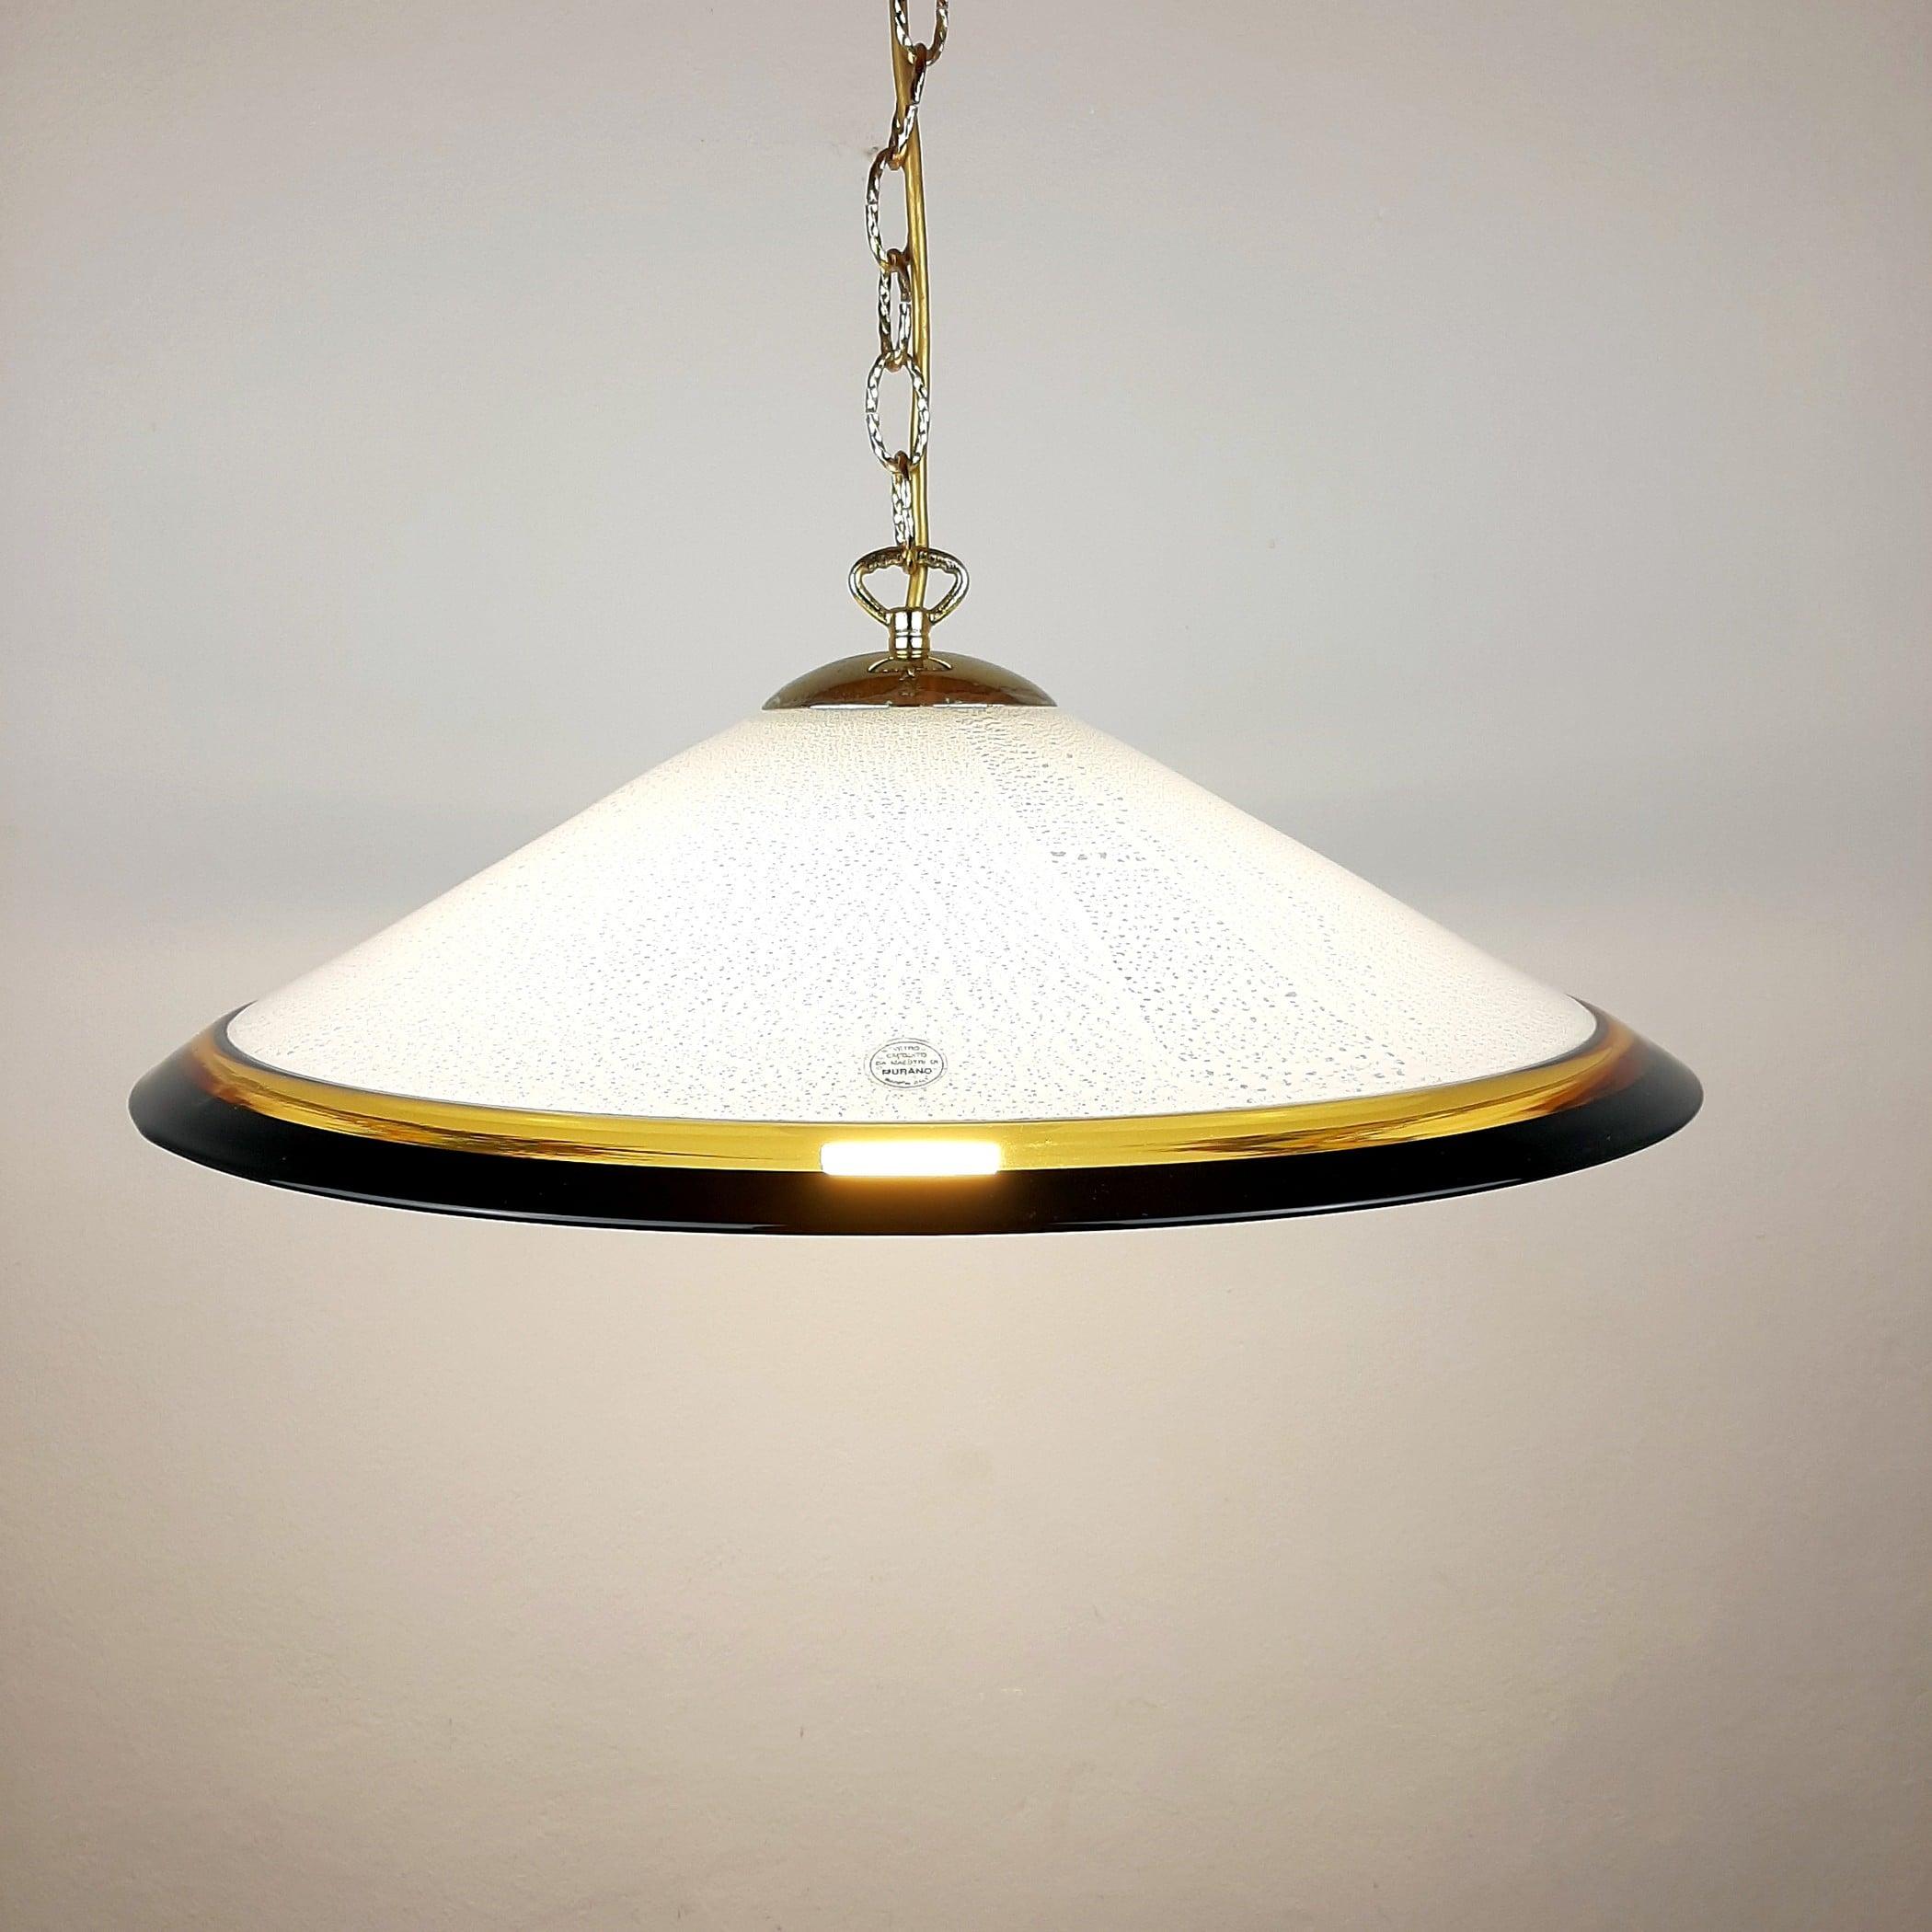 Mid-century murano glass pendant lamp Italy 1970s Black Yellow White Lamp Retro chandelier